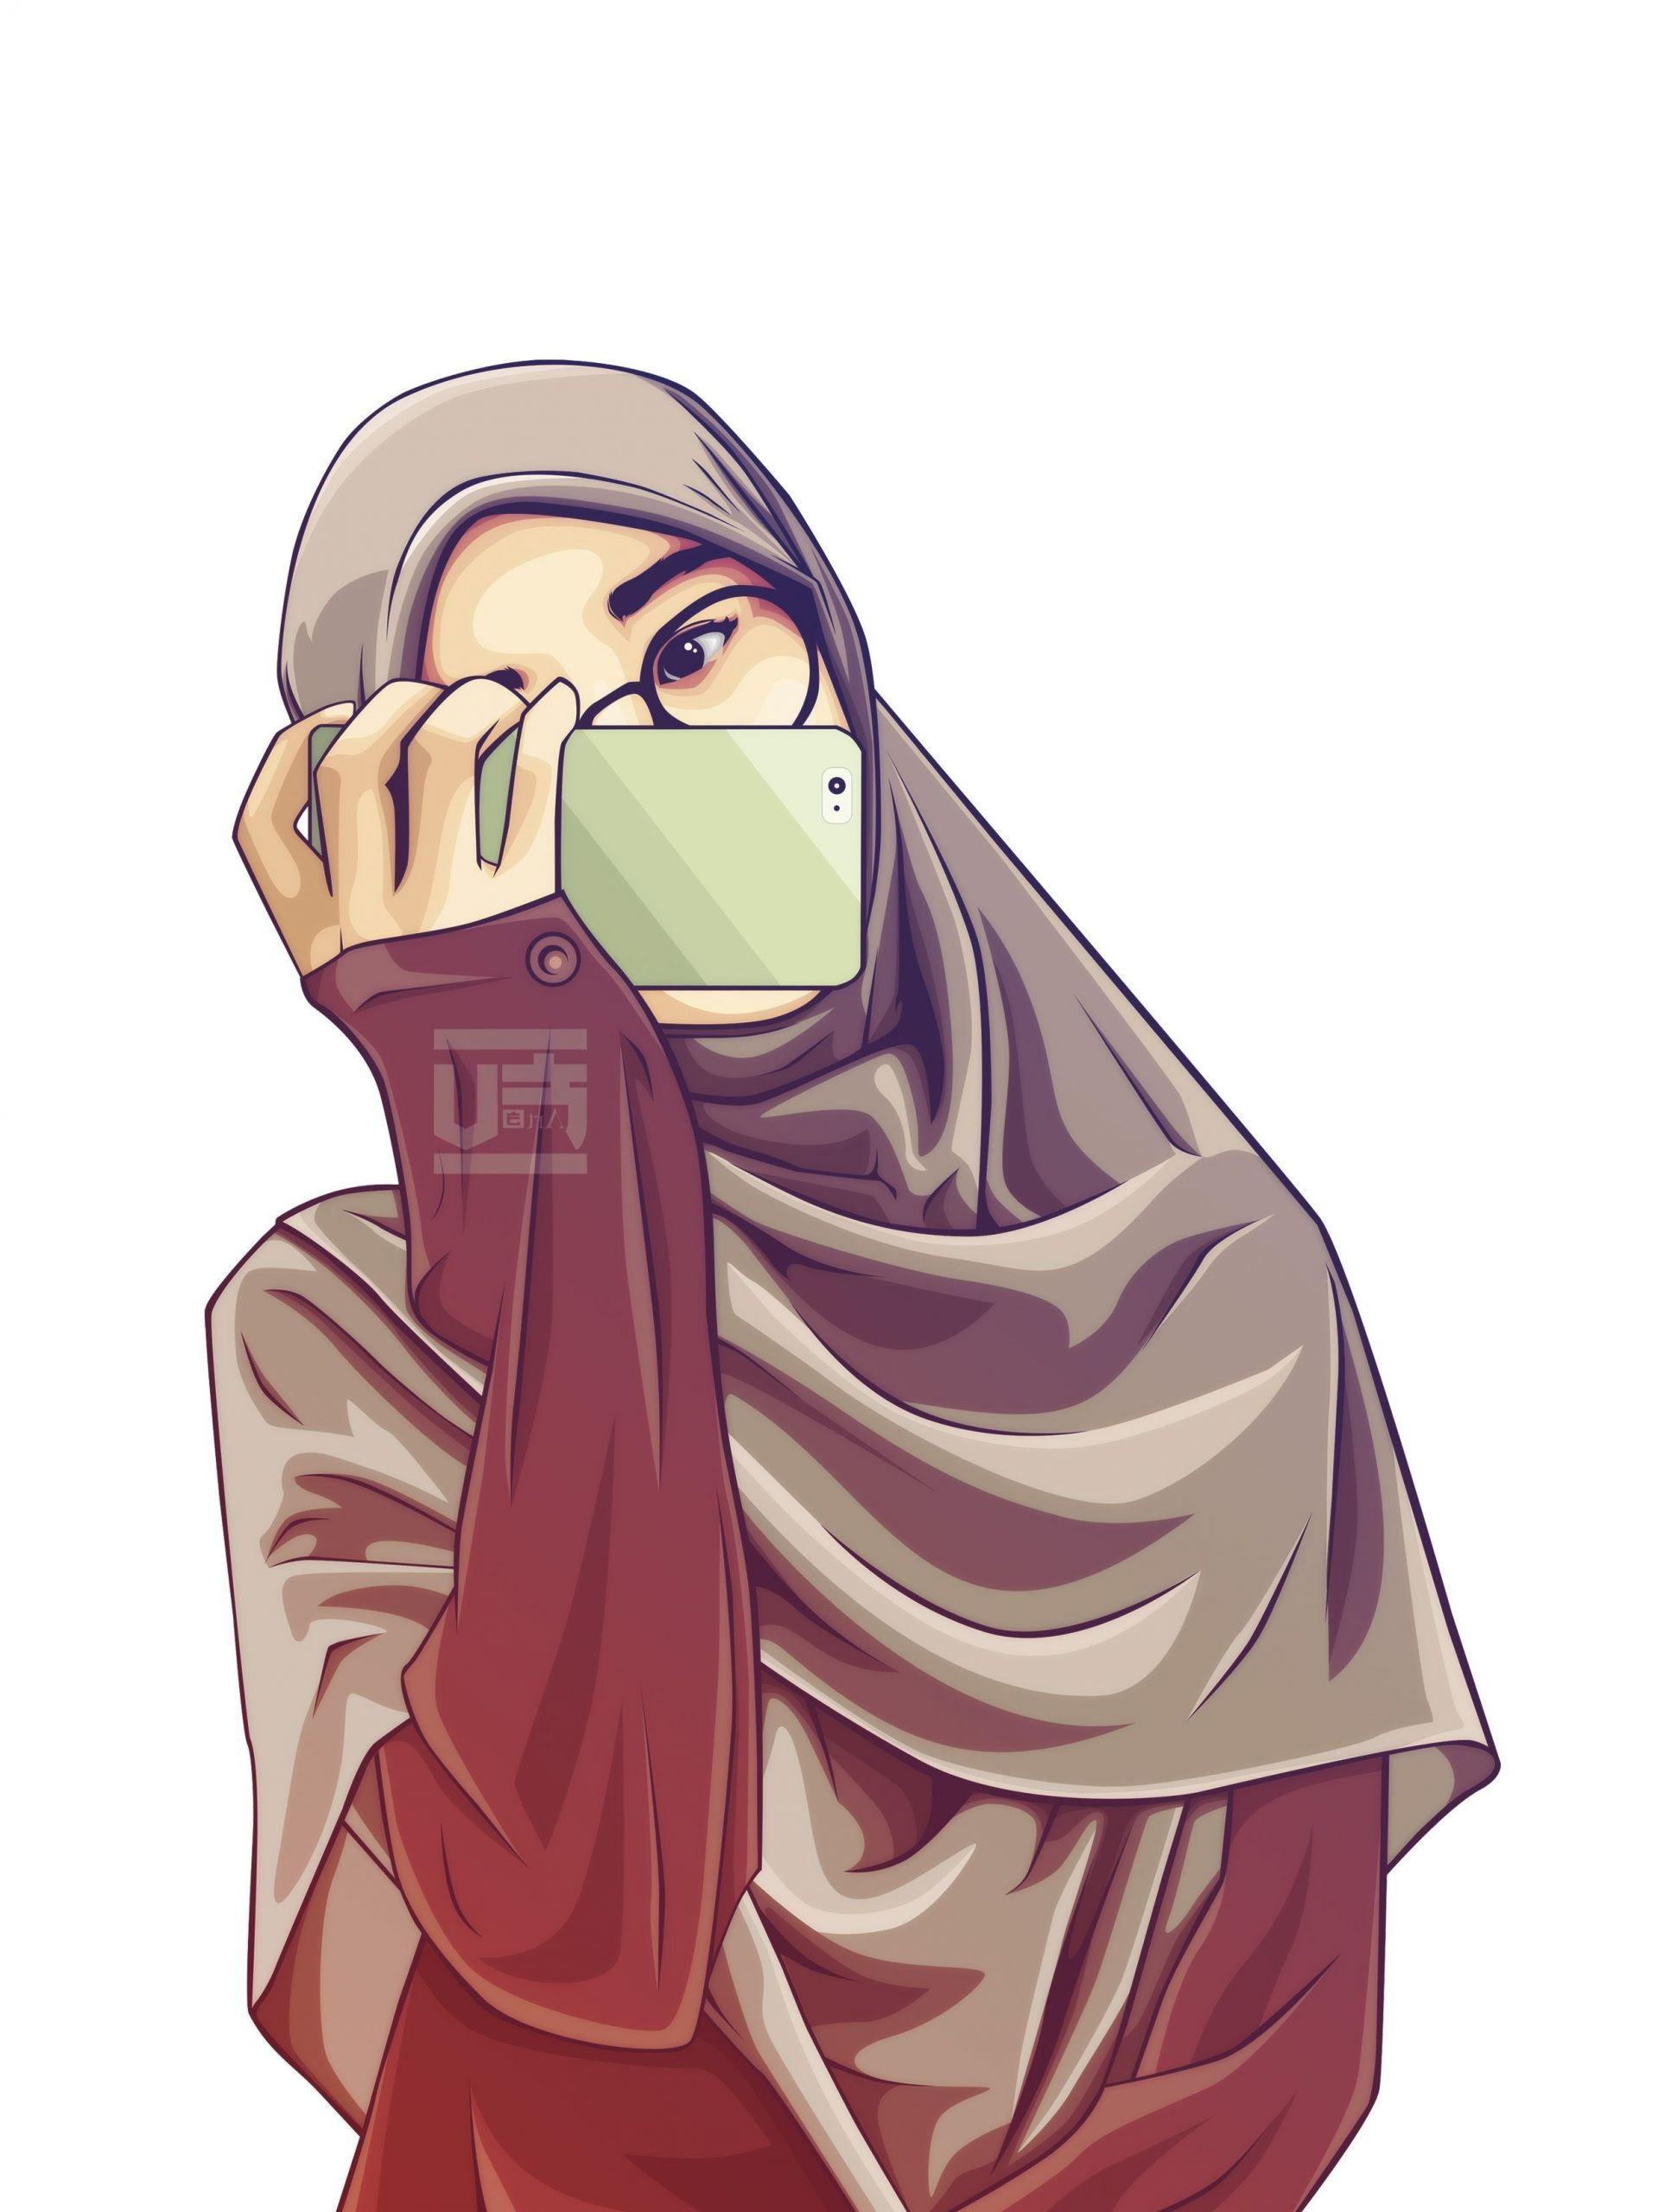 Ide Muslimah Kartun Keren J7do Gambar Kartun Anime Muslimah Gambar Kartun